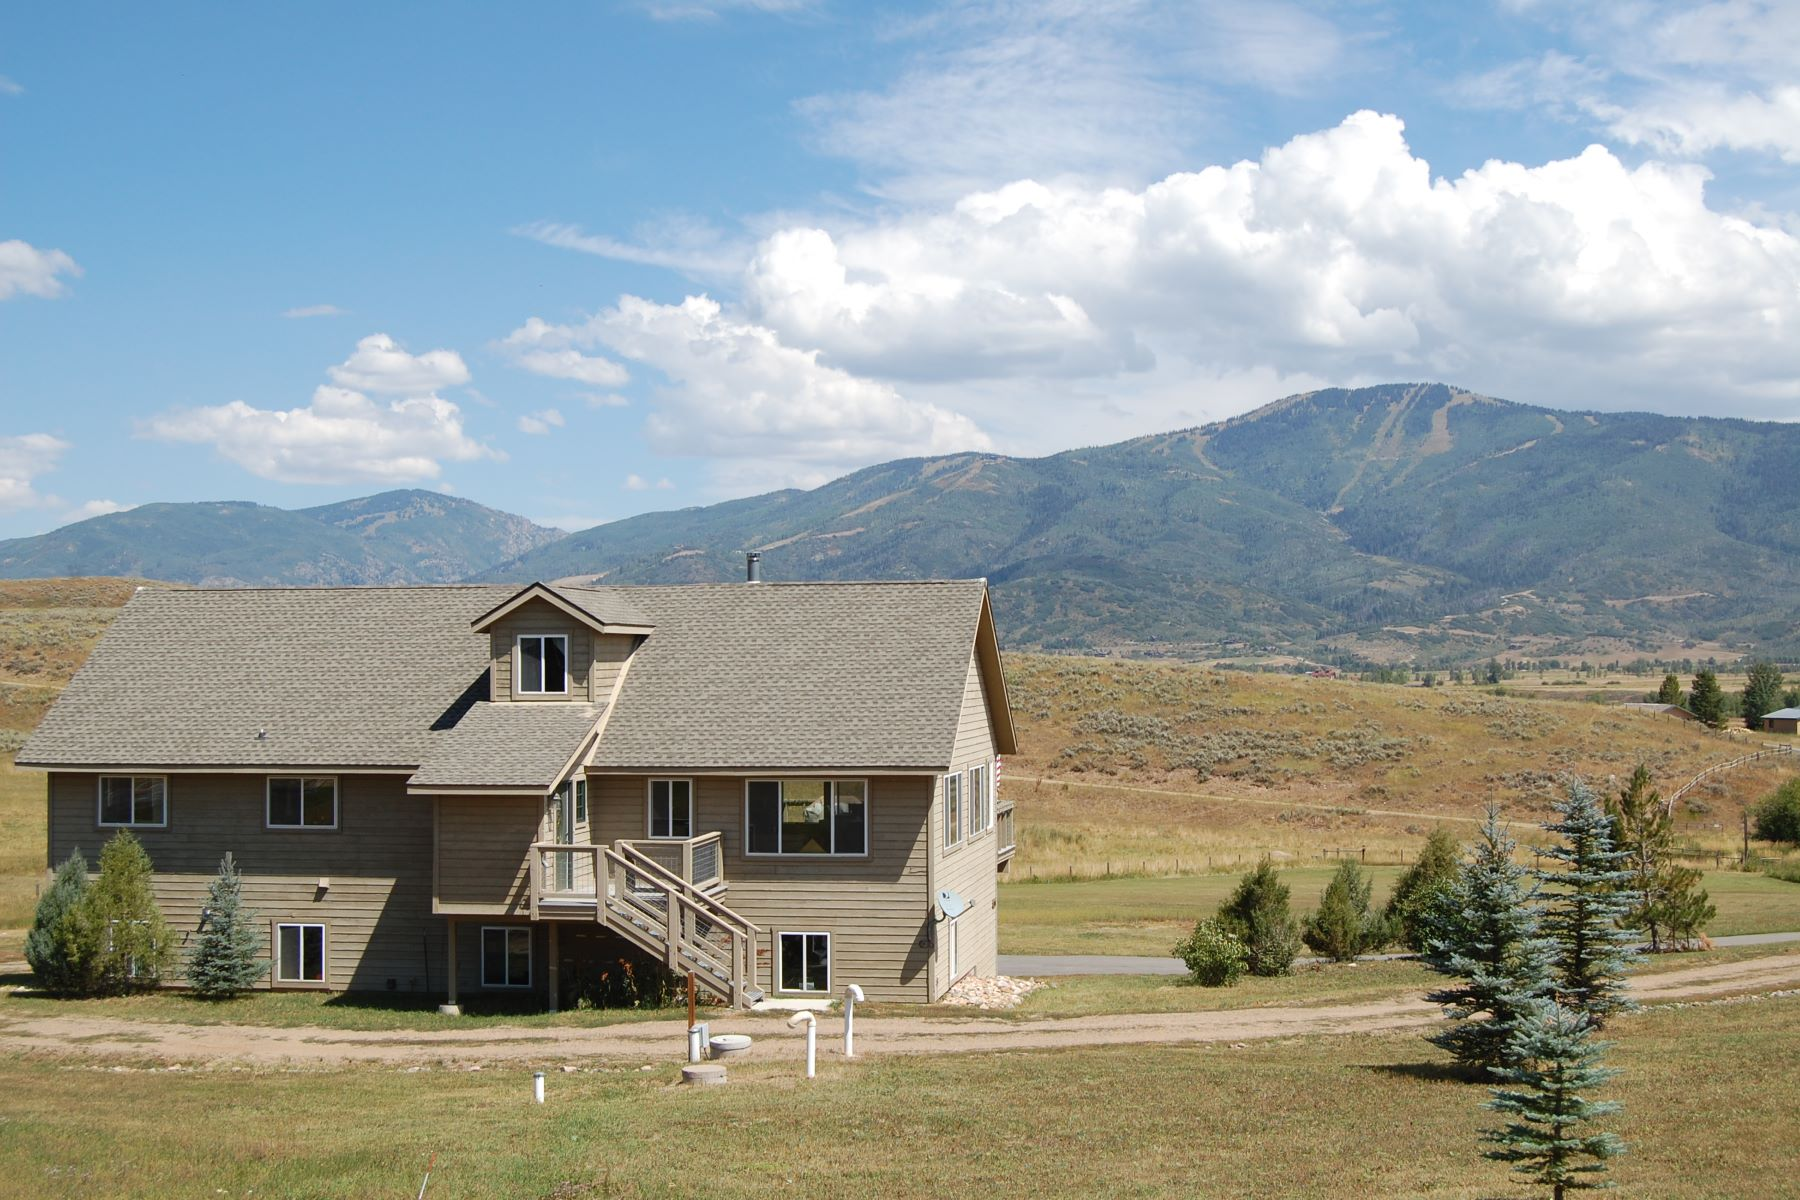 Propiedad en venta Steamboat Springs